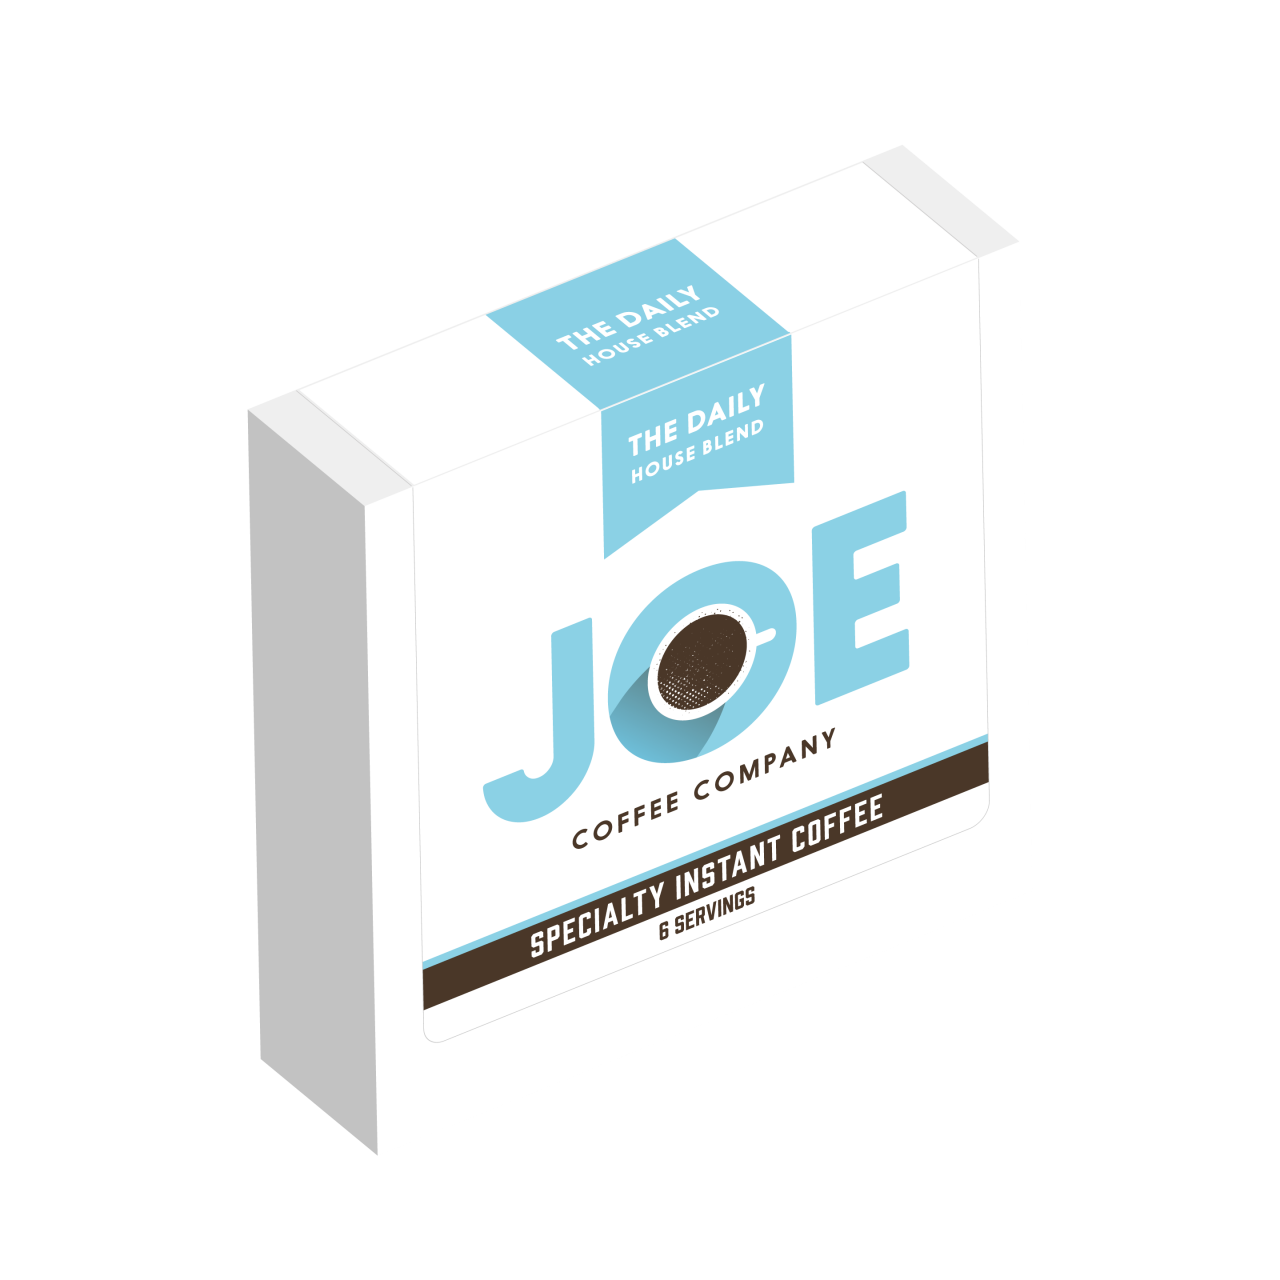 Joe Coffee specialty instant coffee